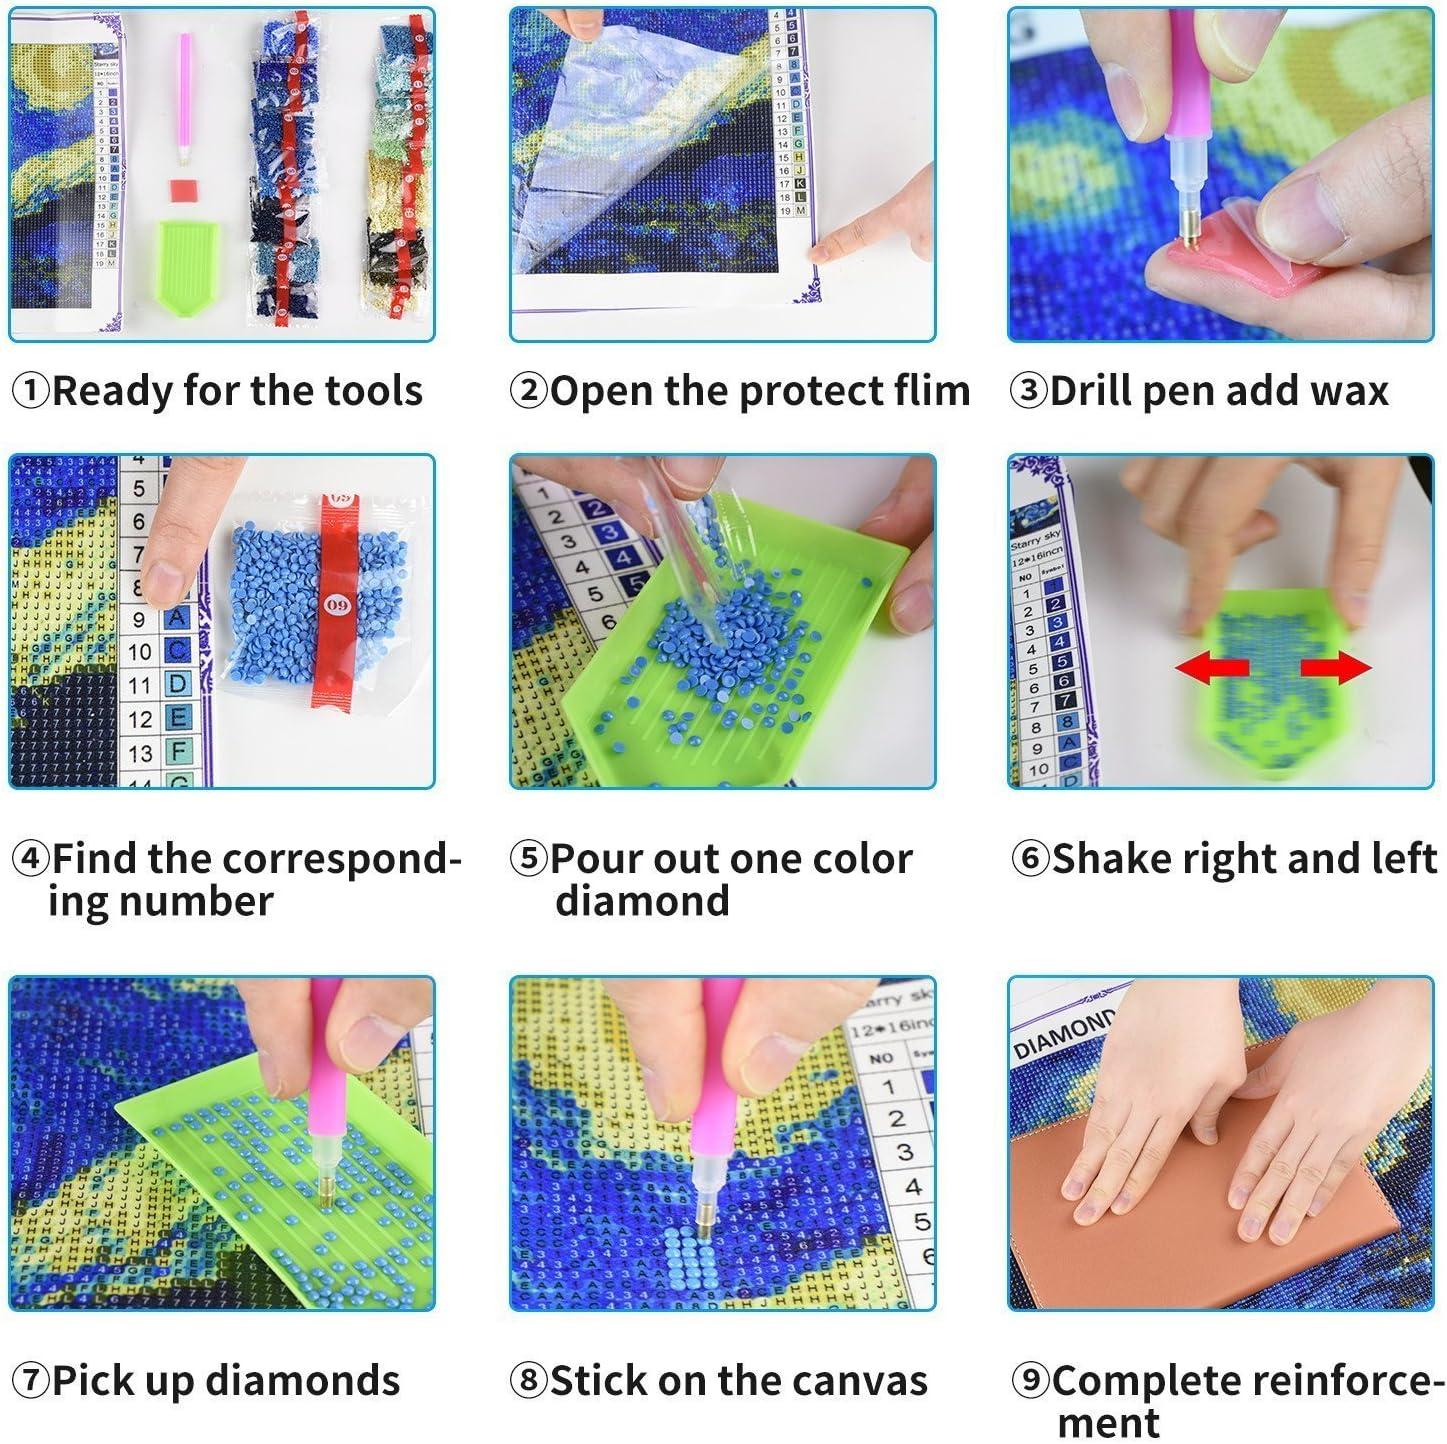 KAMIERFA 5D Diamonds Painting Kits Vollbilder DIY Diamant Painting Stickerei auf Leinwand Kunstwerk Kits f/ür Wand Heimdecor Goldgr/üner Ginkgo 30x30cm